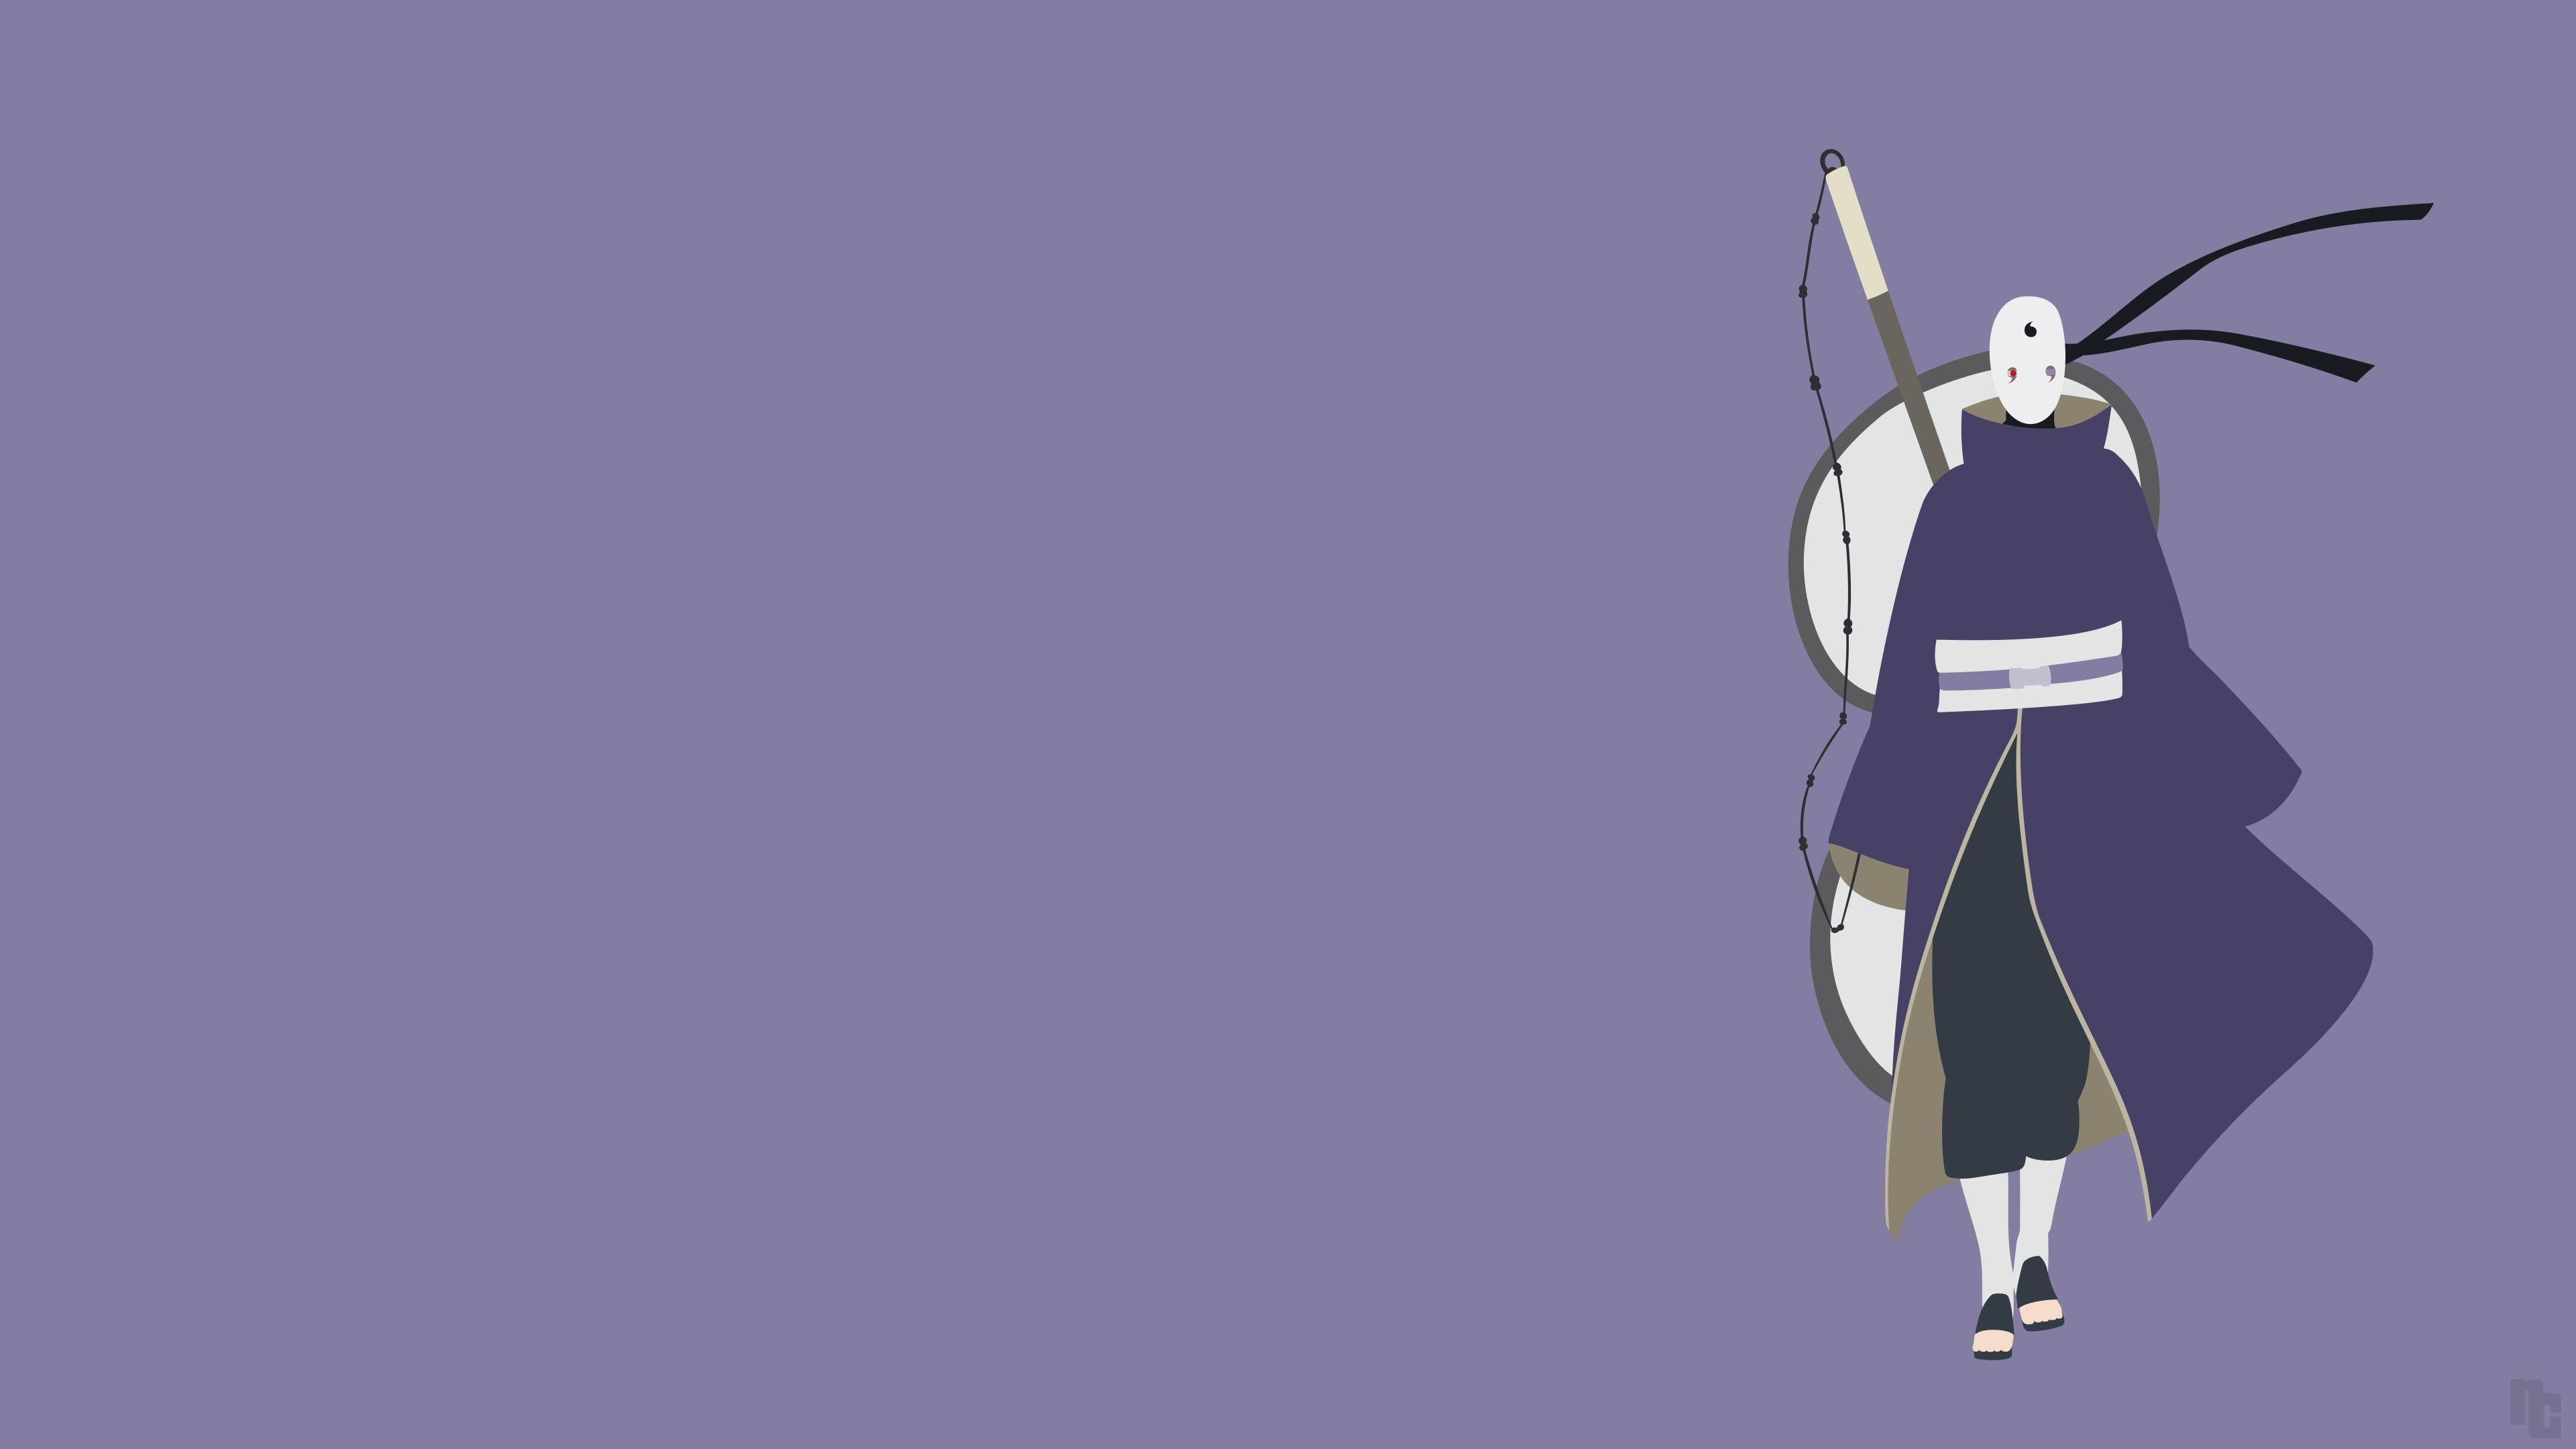 Naruto 4k Ultra Hd Wallpaper Background Image 3840x2160 Id 961683 Wallpaper Abyss